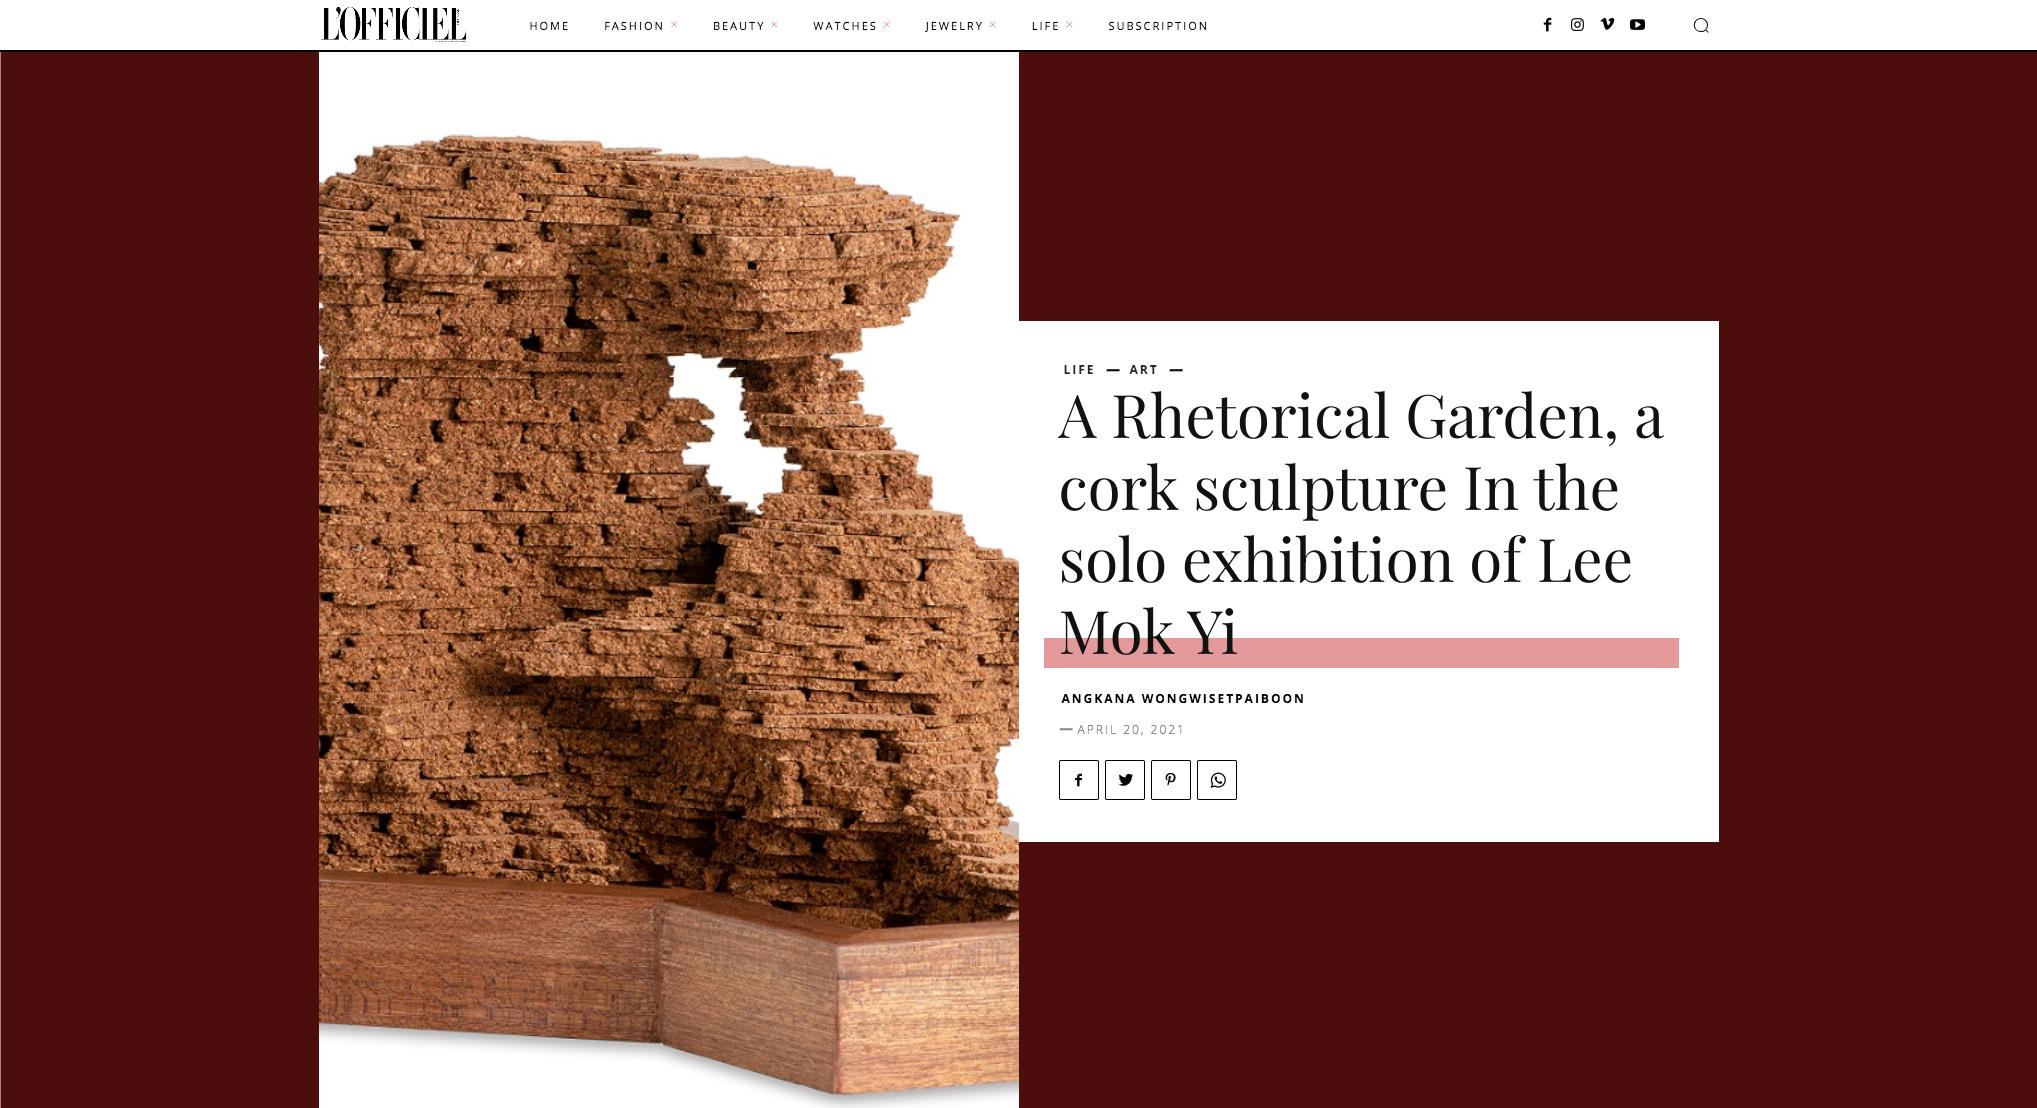 L'Officiel – A Rhetorical Garden, a cork sculpture In the solo exhibition of Lee Mok Yi